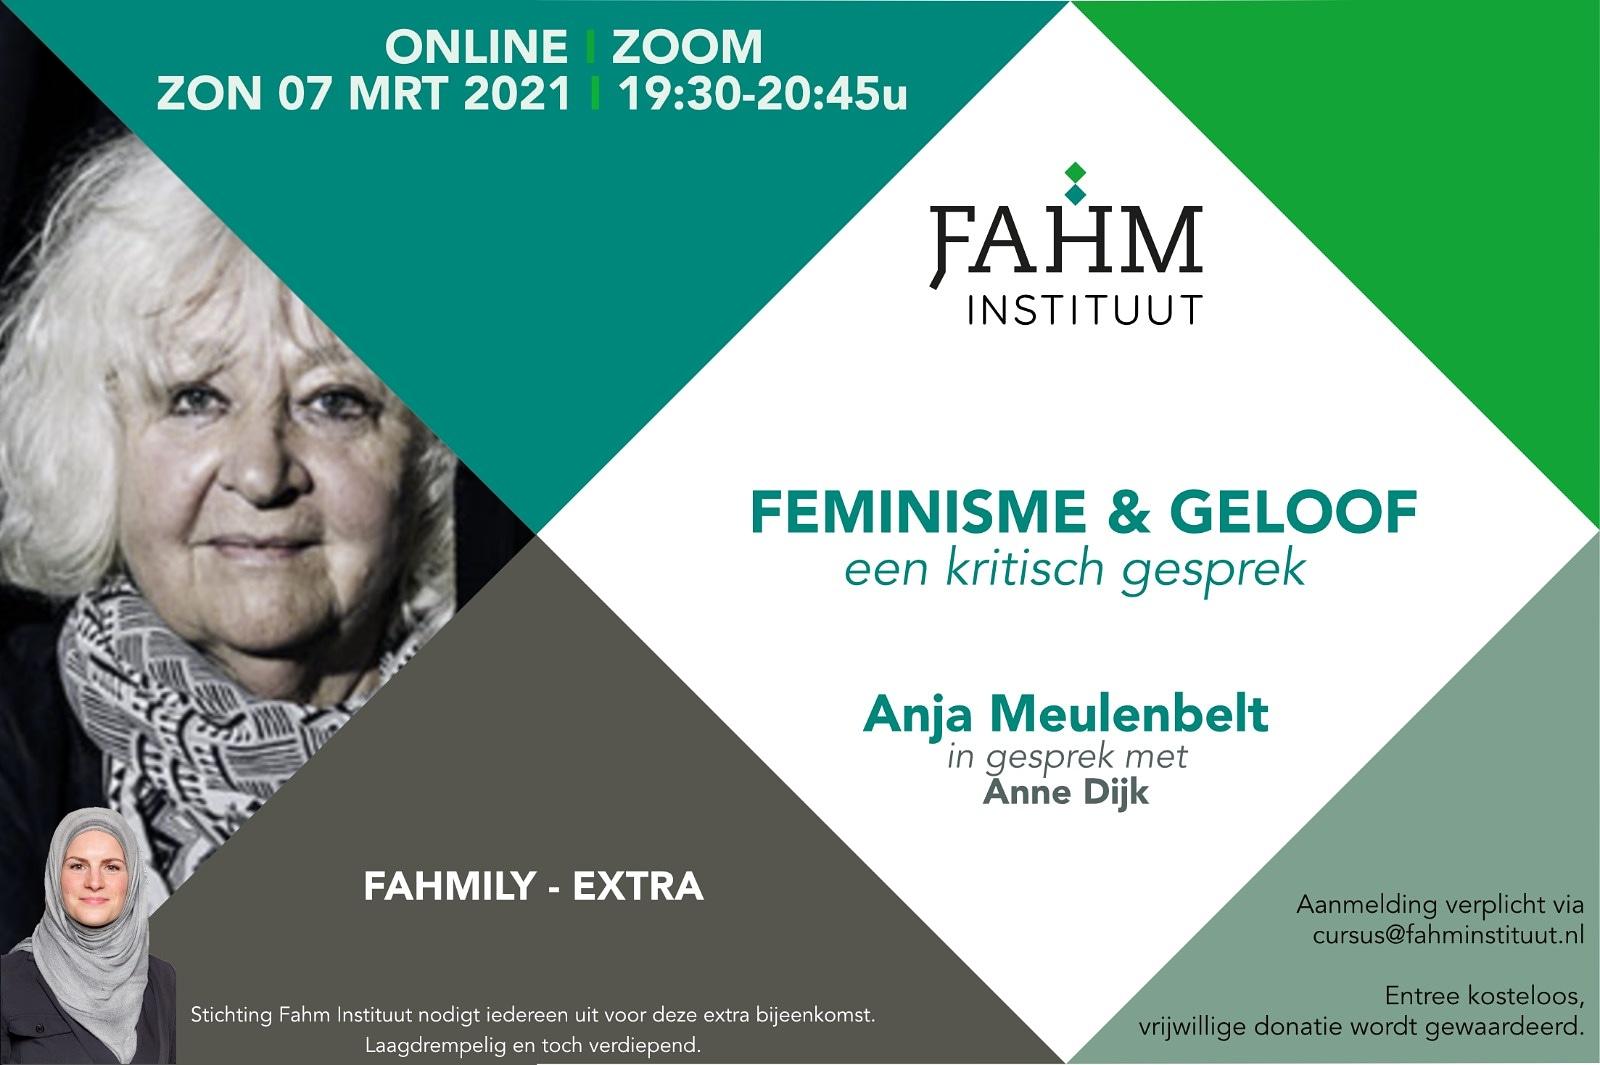 07-03-2021 Fahm-EXTRA Feminisme en geloof